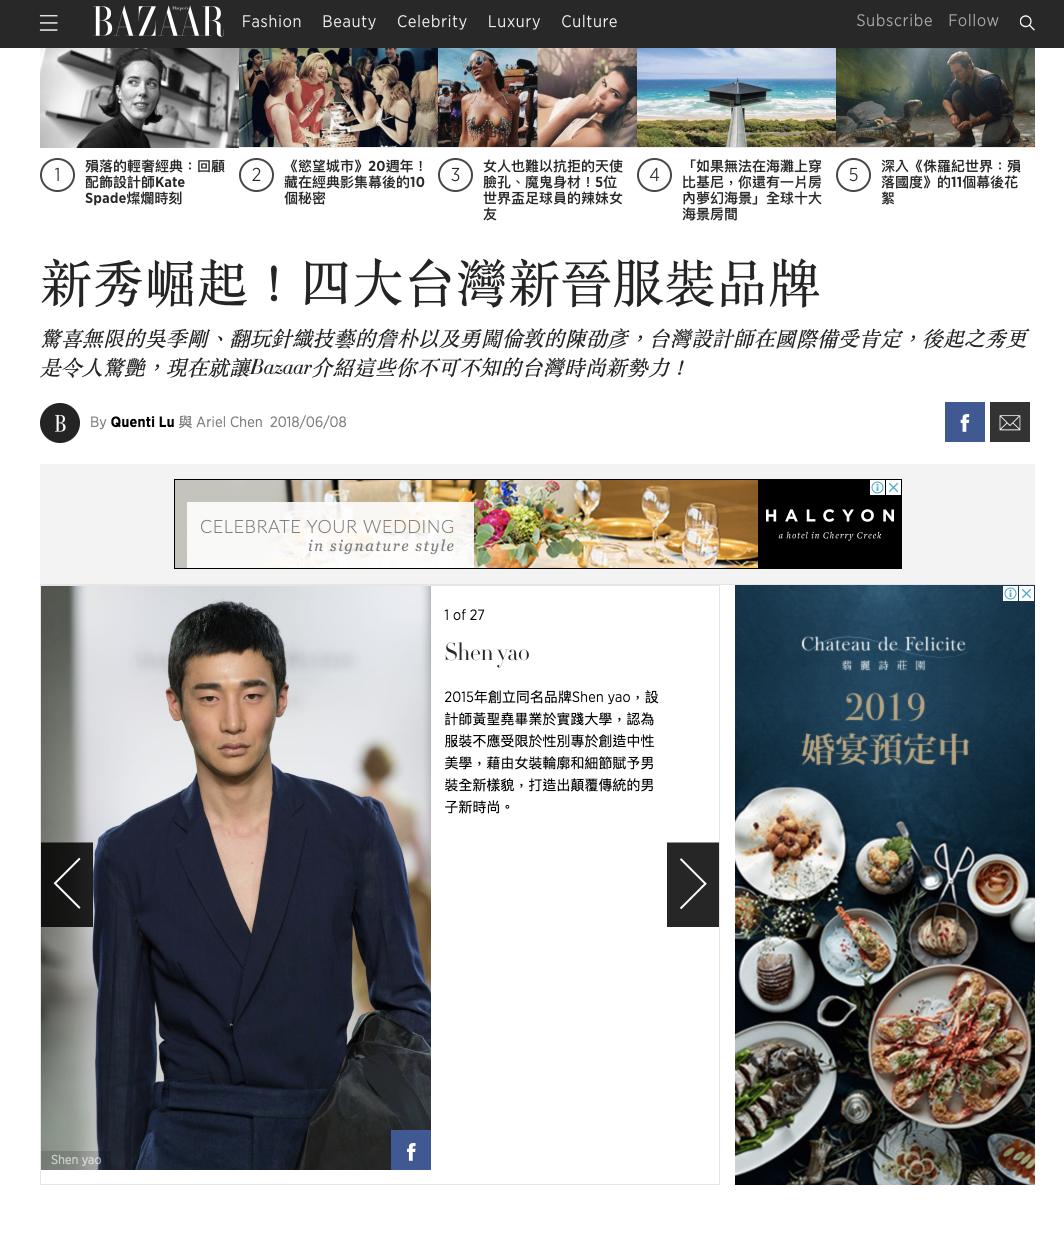 Harper's BAZAAR Taiwan Featured